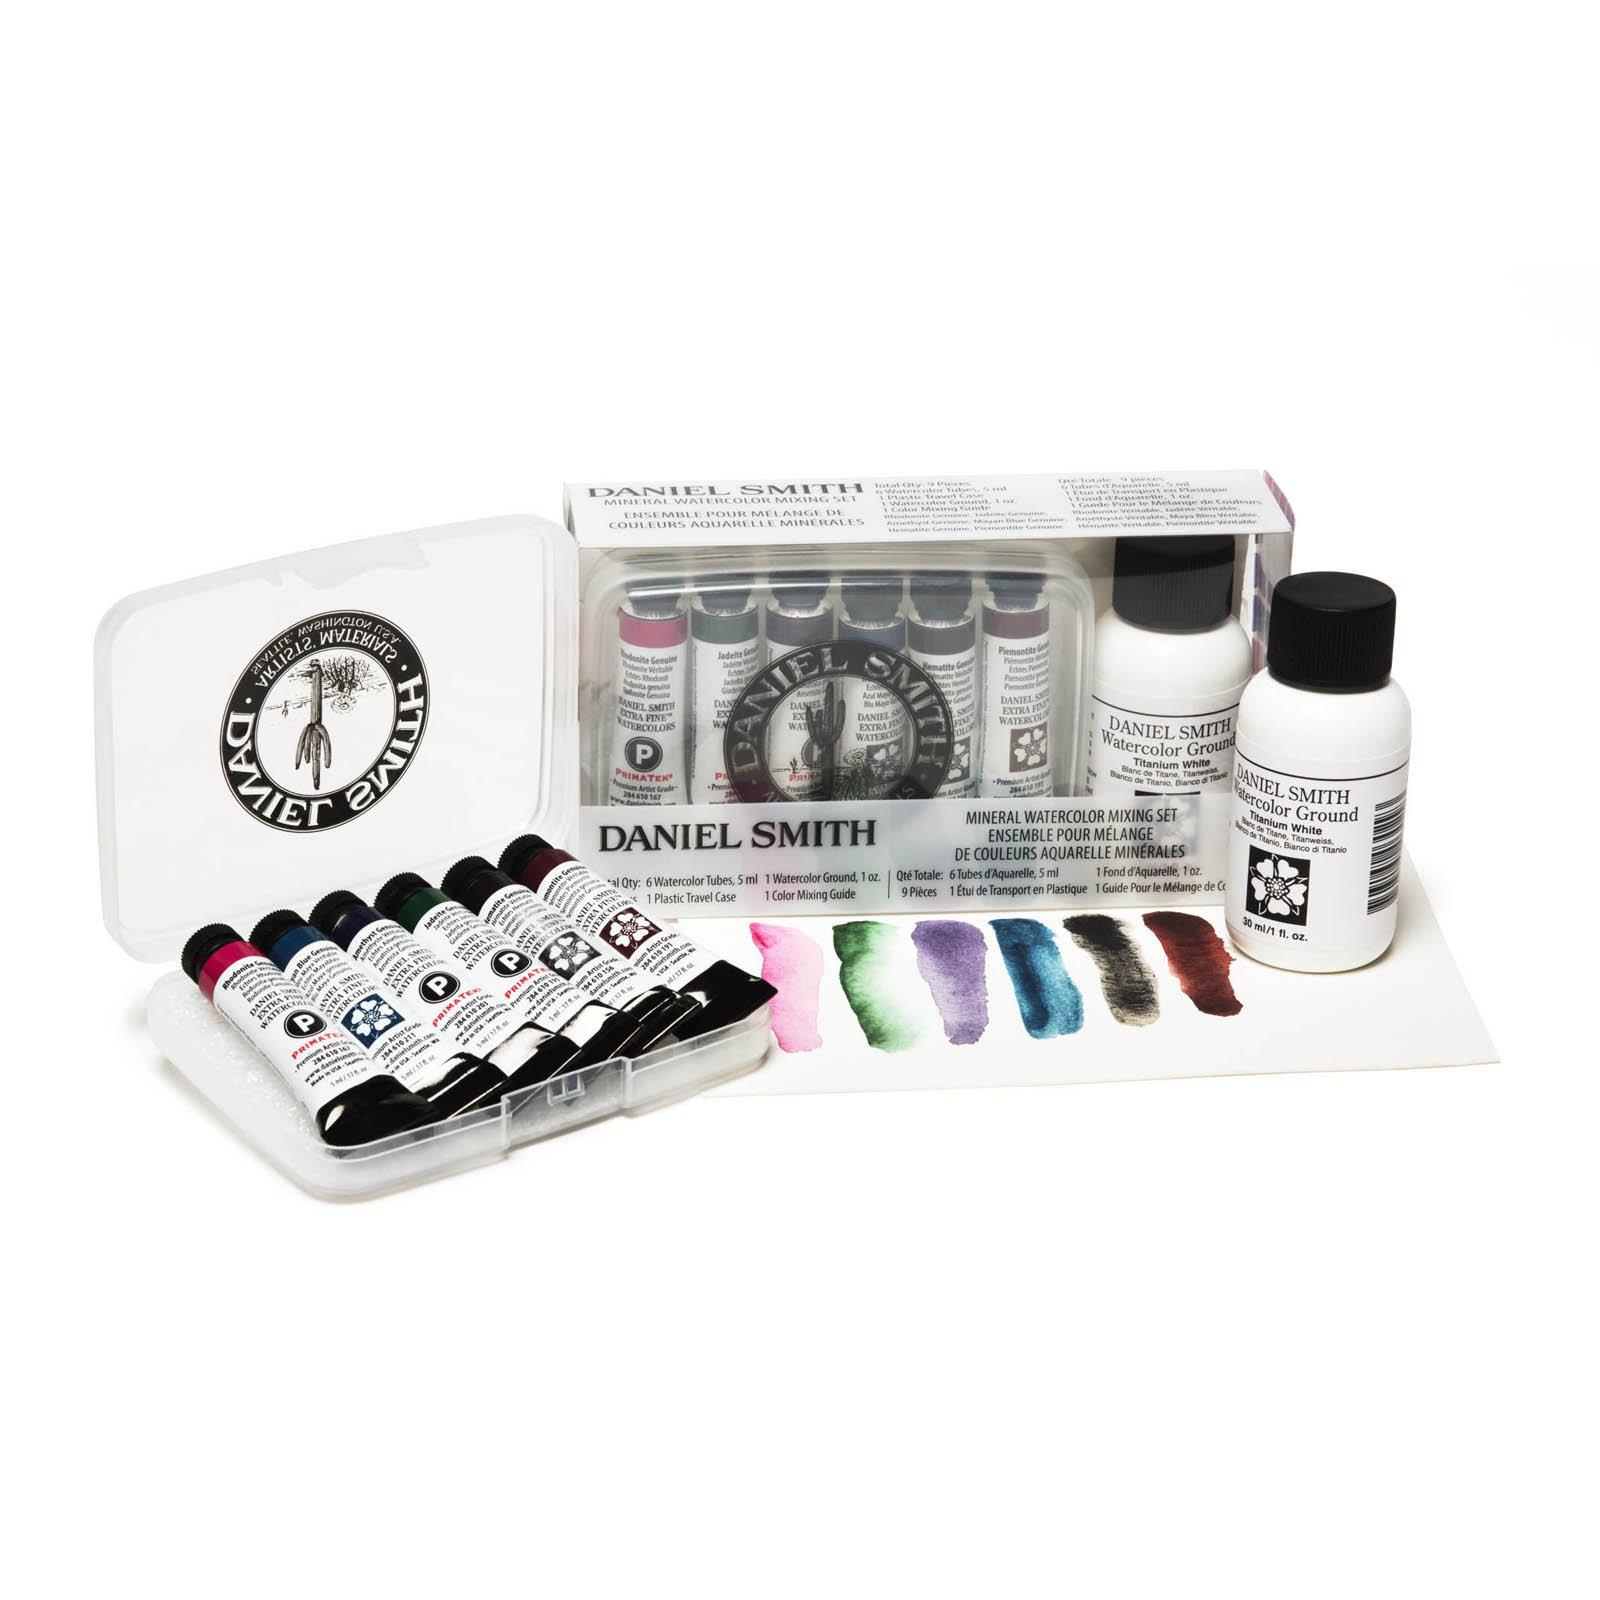 Daniel Smith Extra Fine Watercolor 6 Color 5ml Mineral Mixing Set